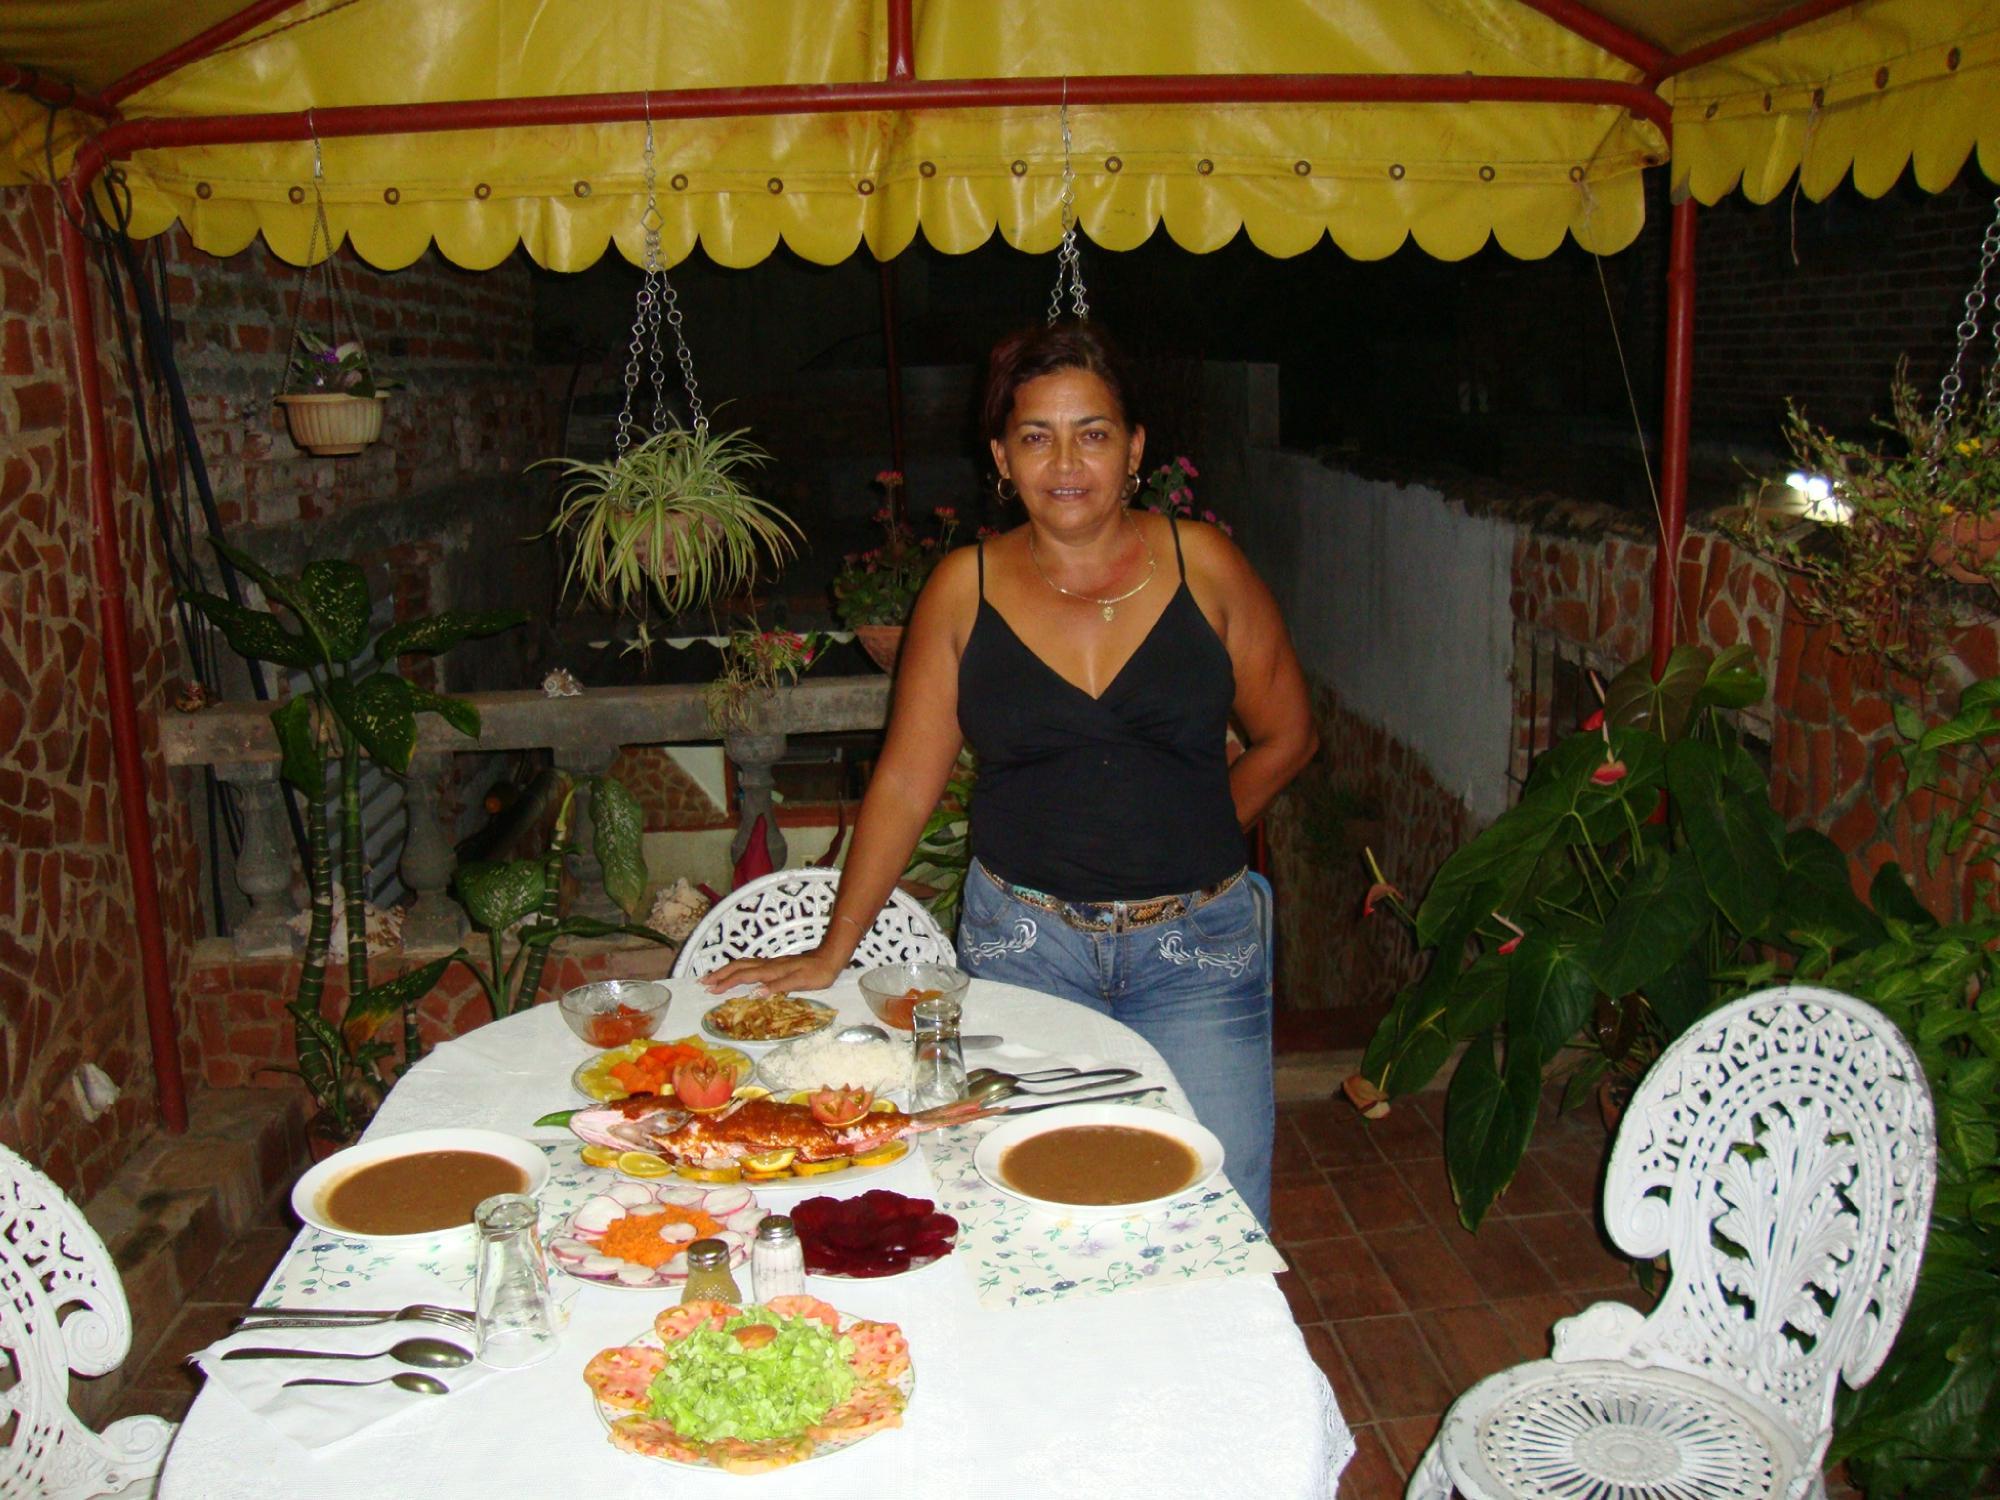 Rent Room Lidia Calzada